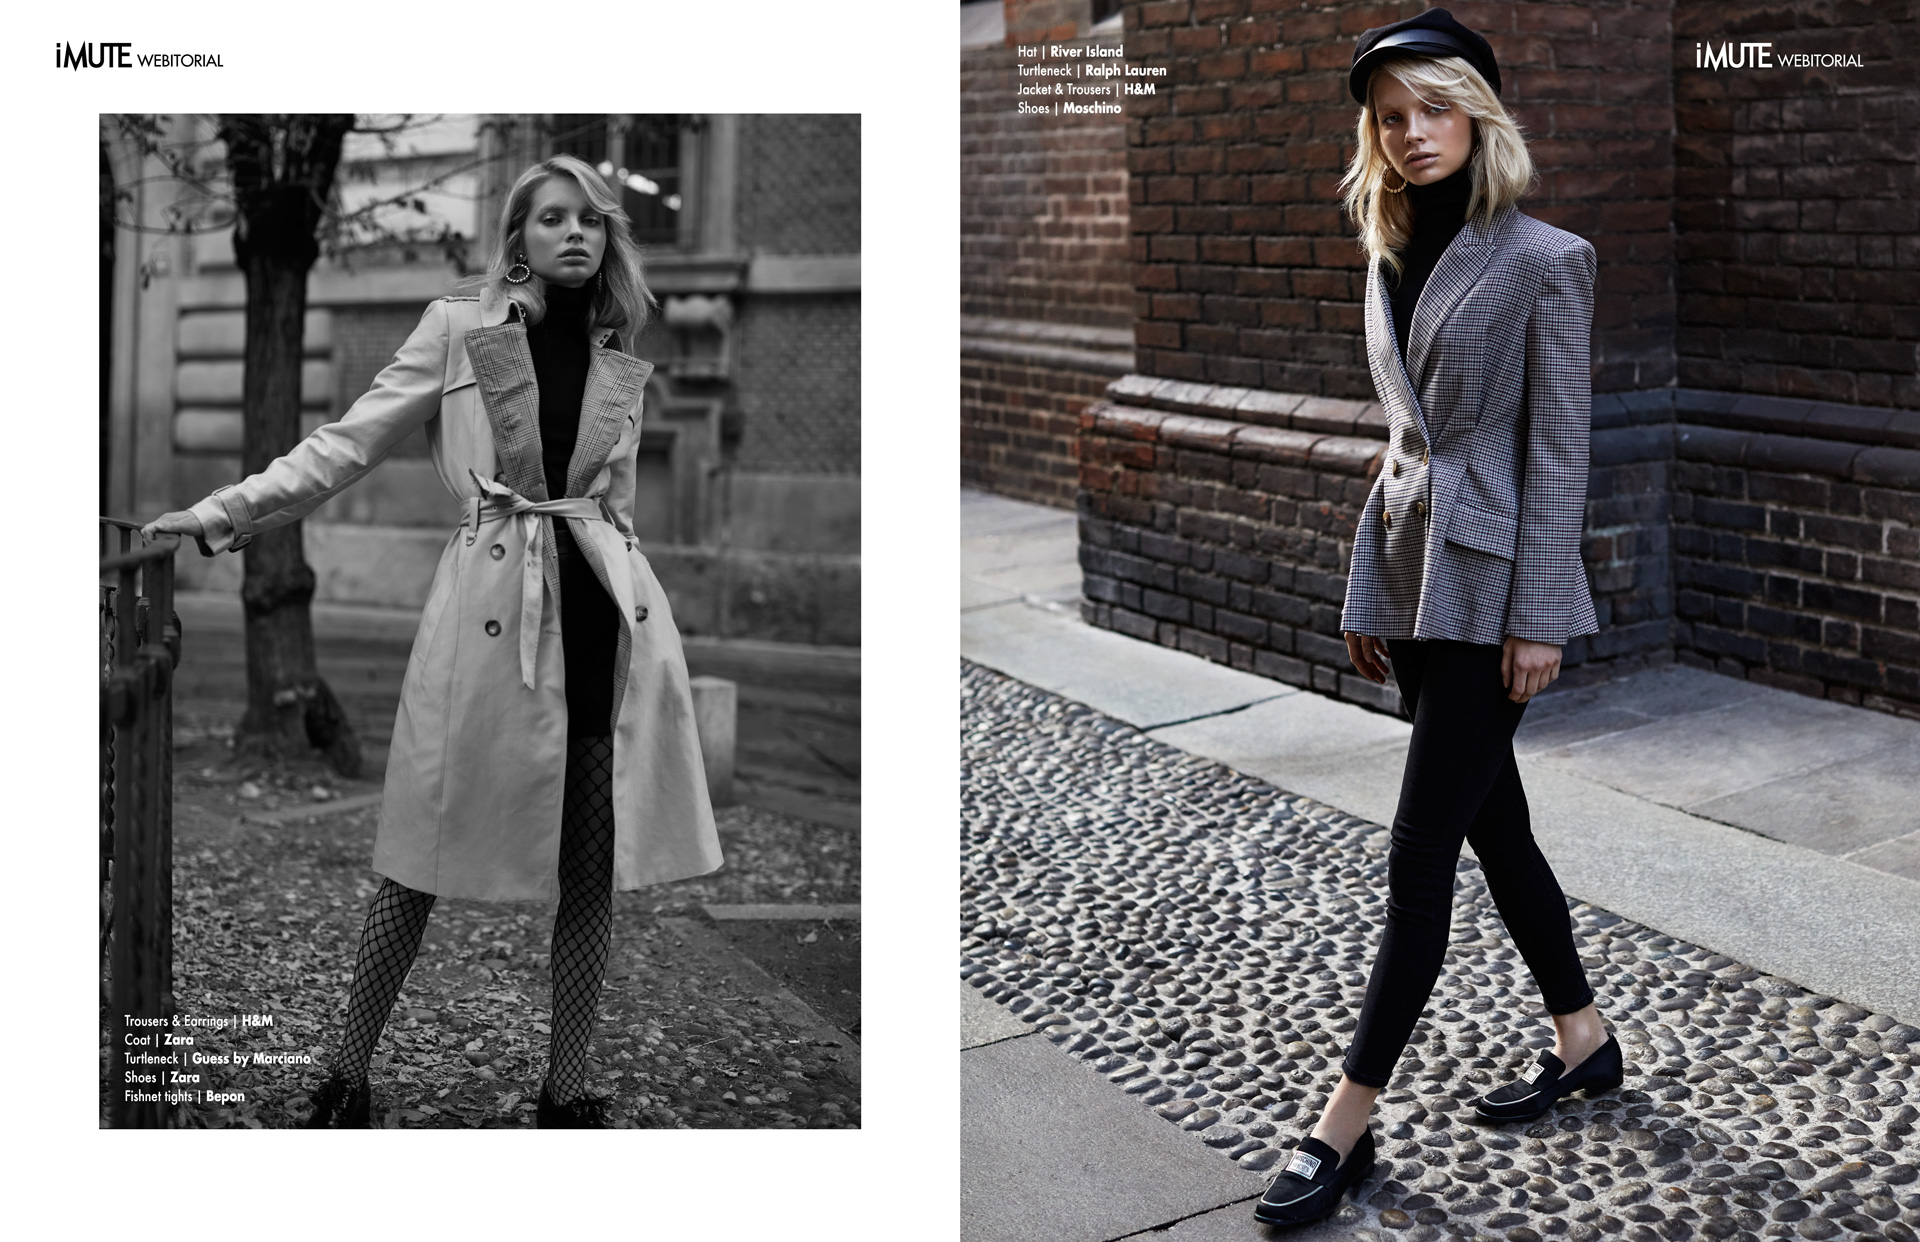 November Graduate webitorial for iMute Magazine Photographer|Alexandra Rymsinova Model| Maria Zachariassen @MP Model Management Milano Stylist|Barbora Yurkovic Makeup & Hair|Alessandra Semisa